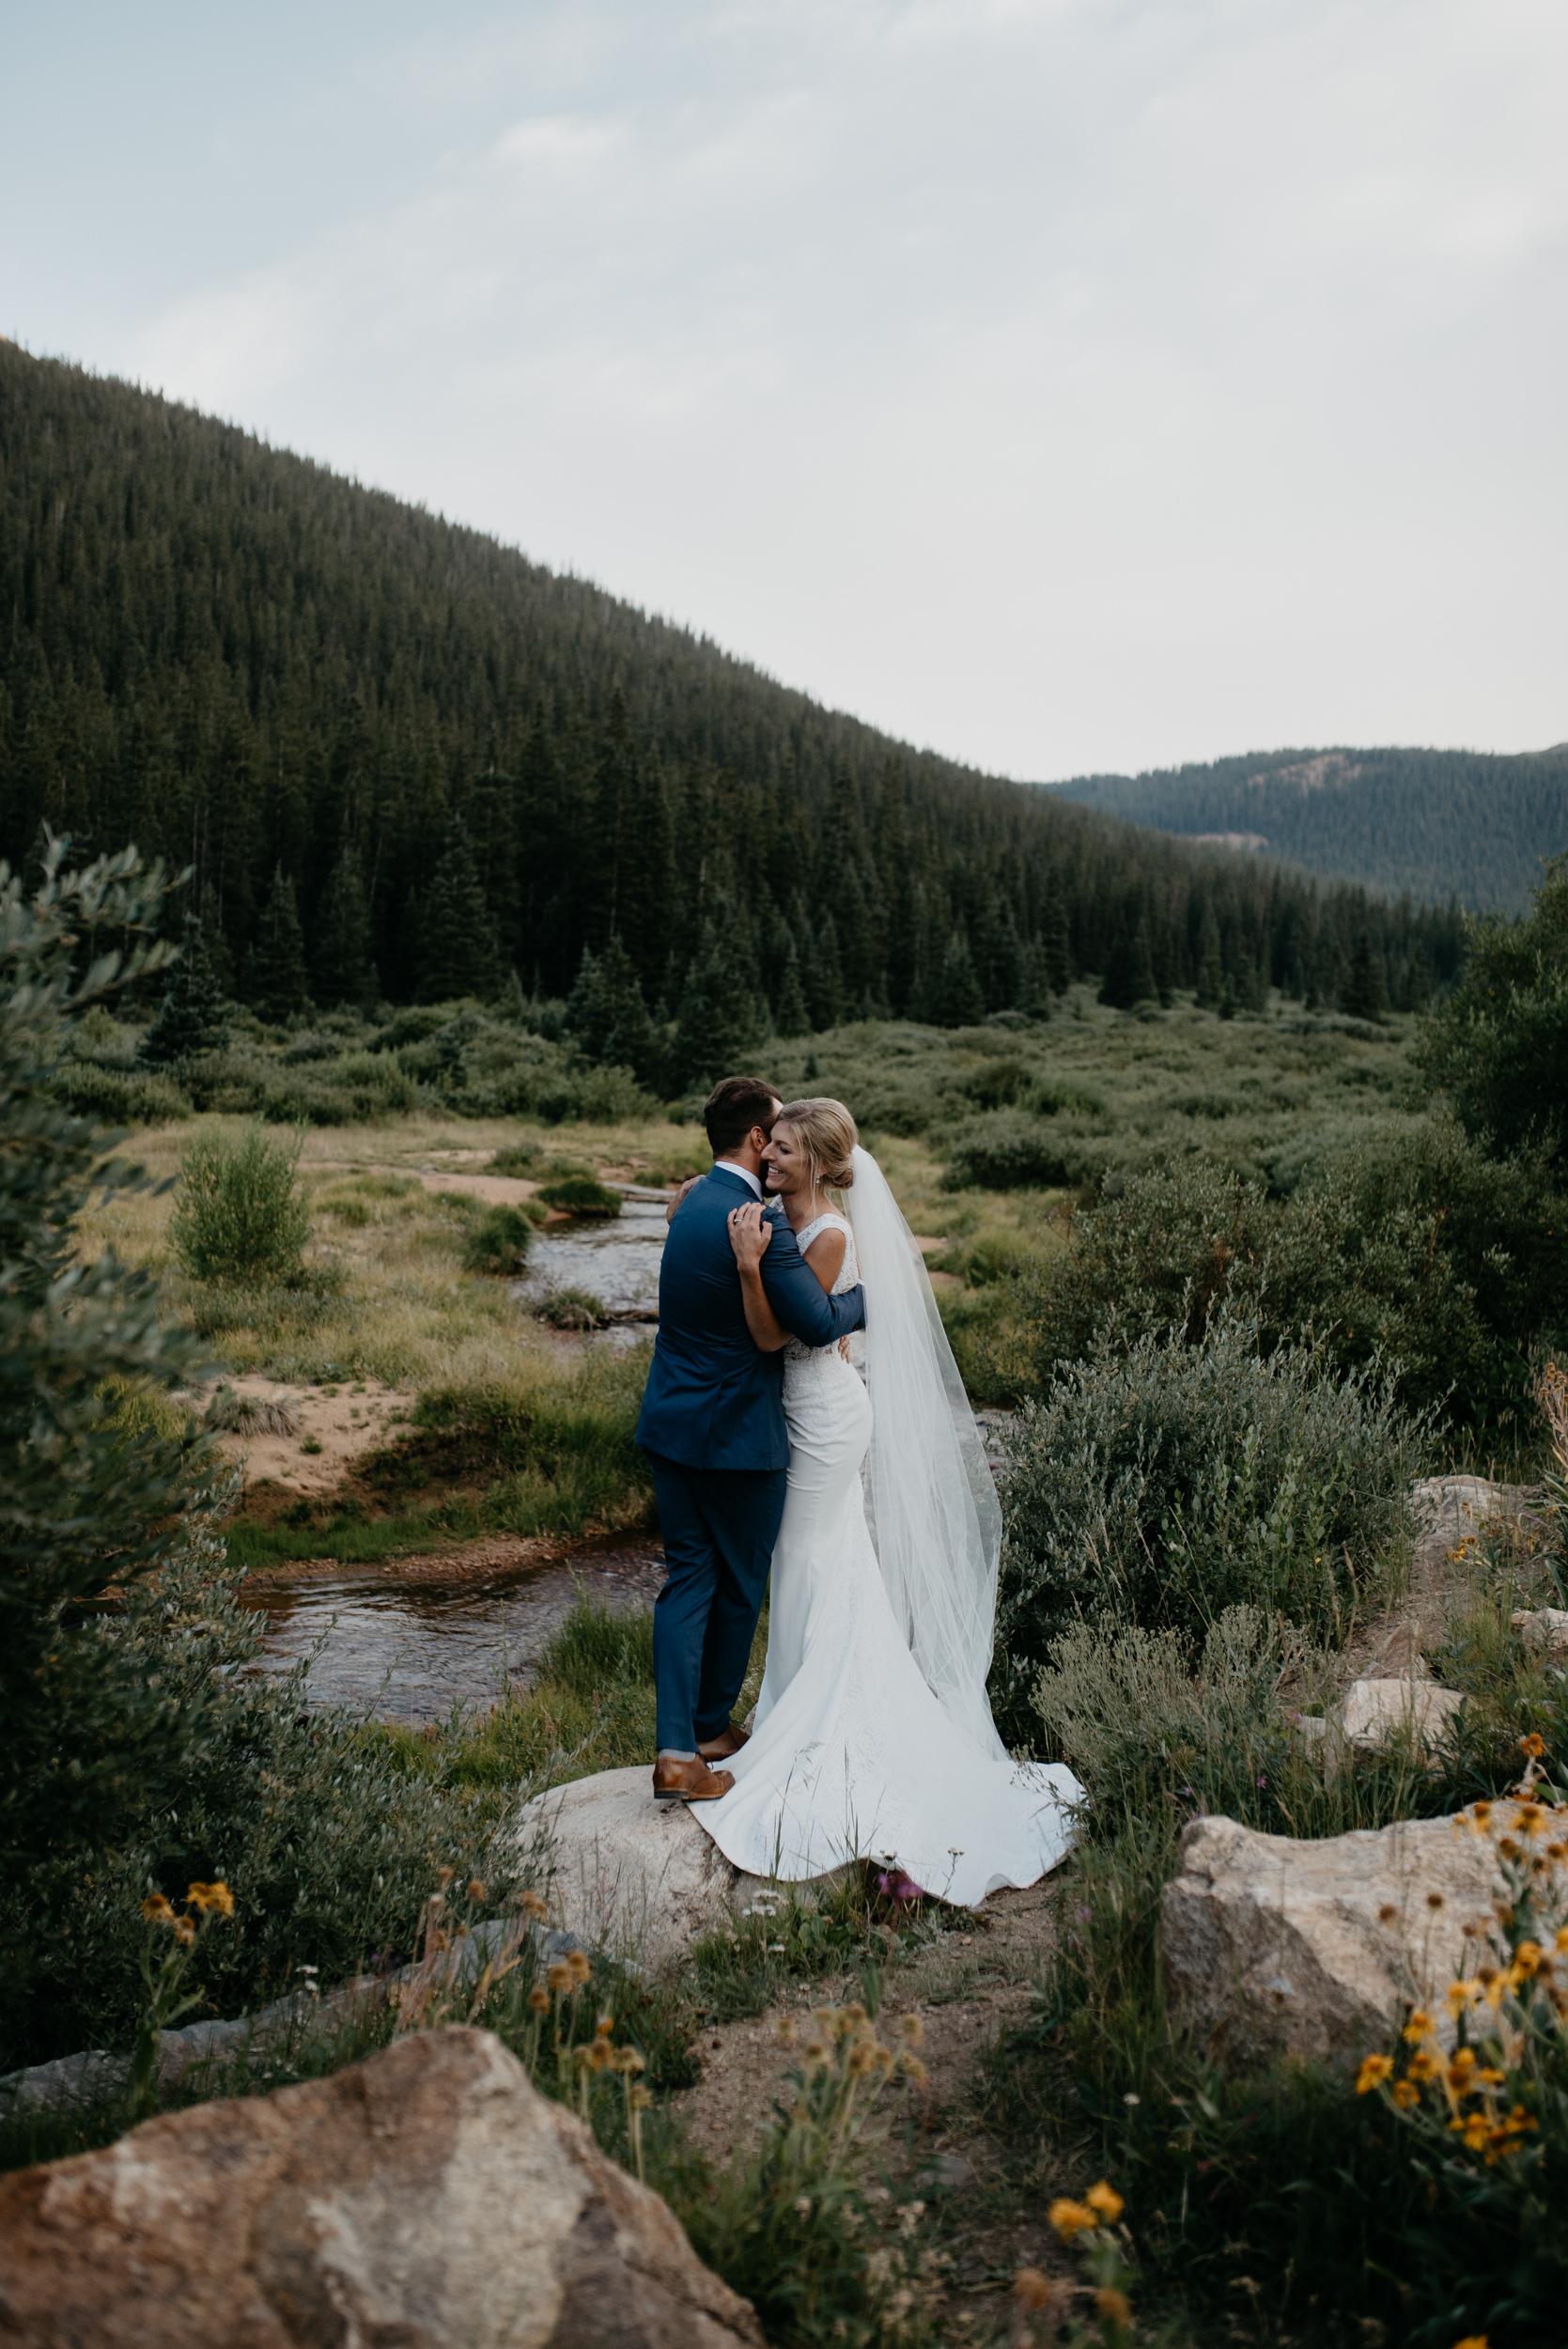 Photos by Alyssa Reinhold of a Guanella Pass elopement in Colorado.